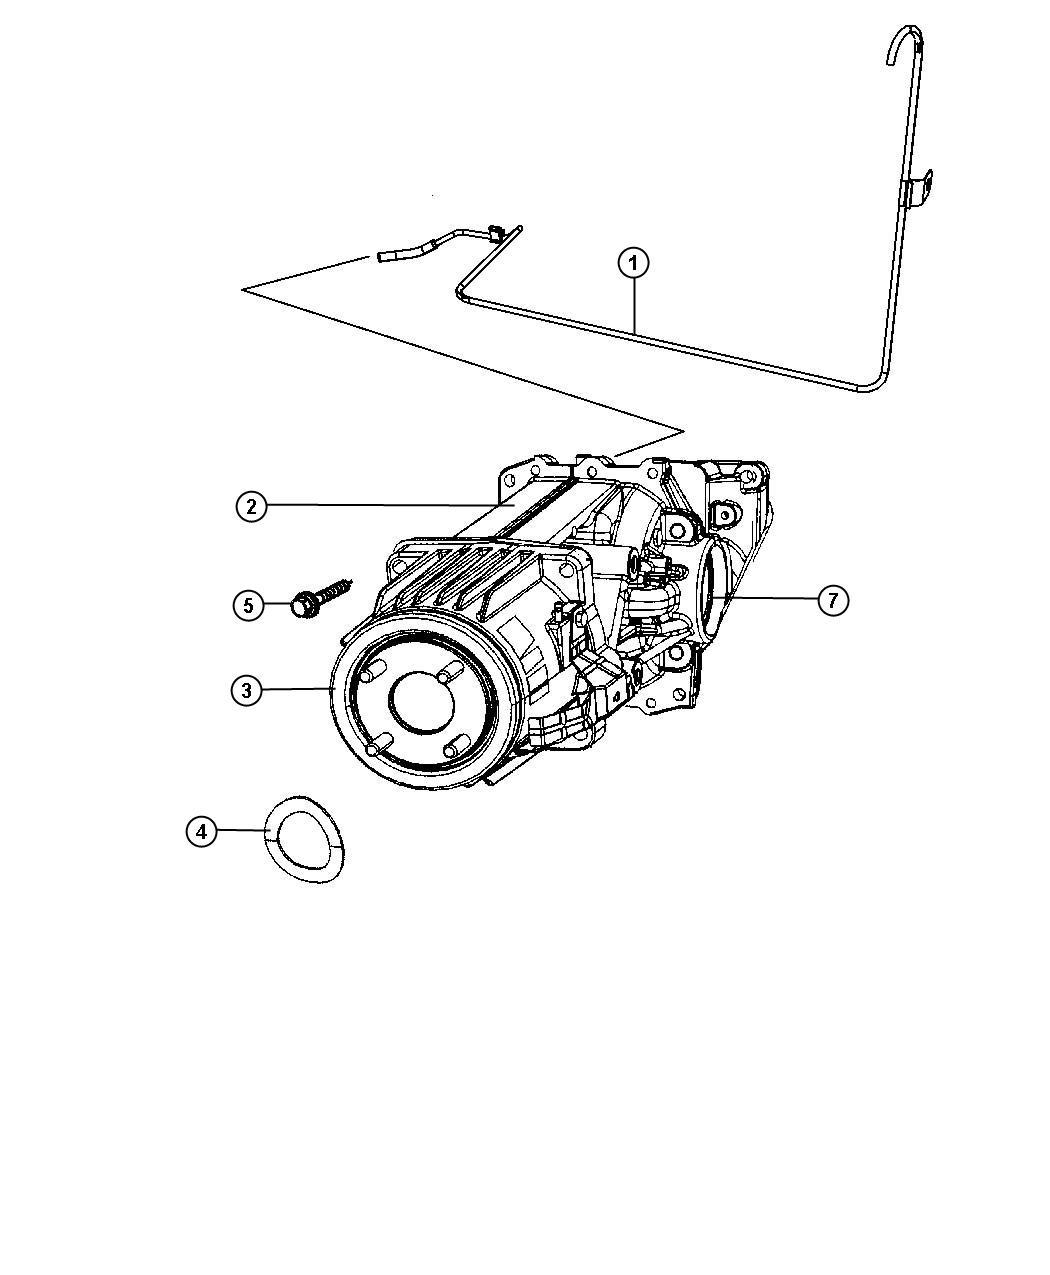 Jeep Patriot Differential  Rear Axle  Dav  Suspension